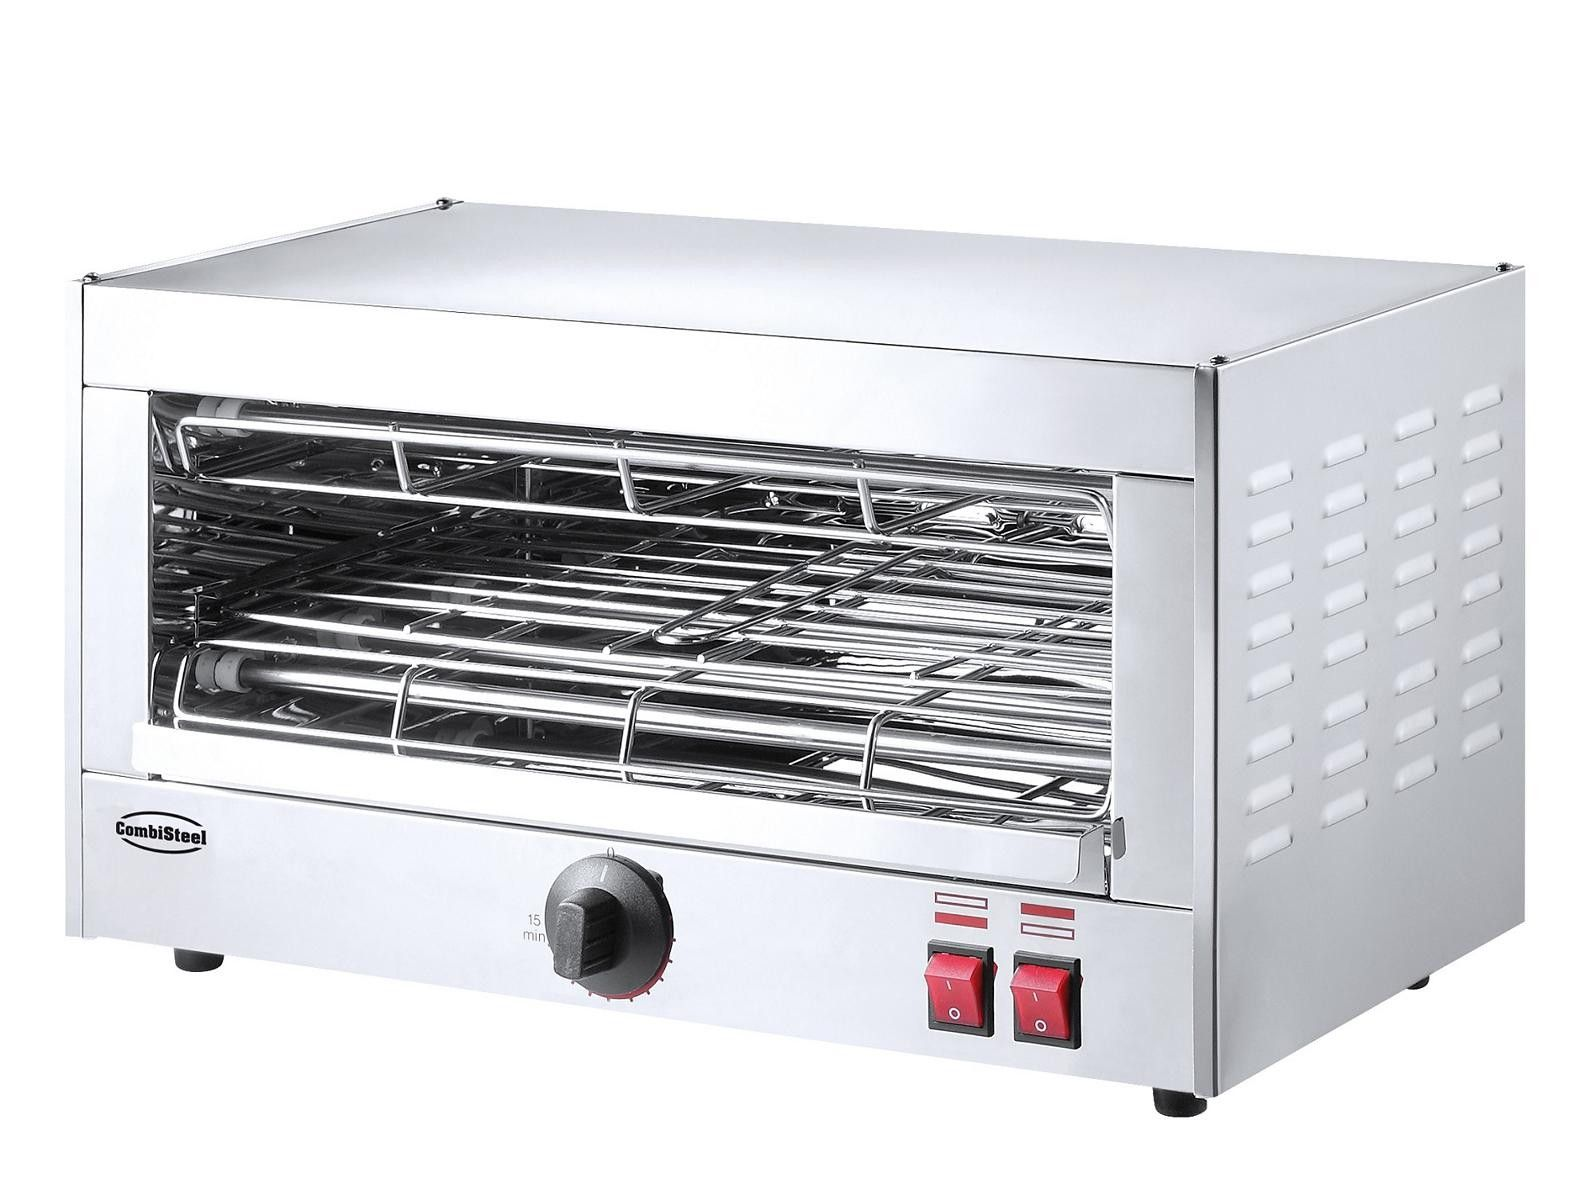 Salamander Toaster 19 Stufig, 19.19kW, TxBxH 1950x1990x1980mm in 190190